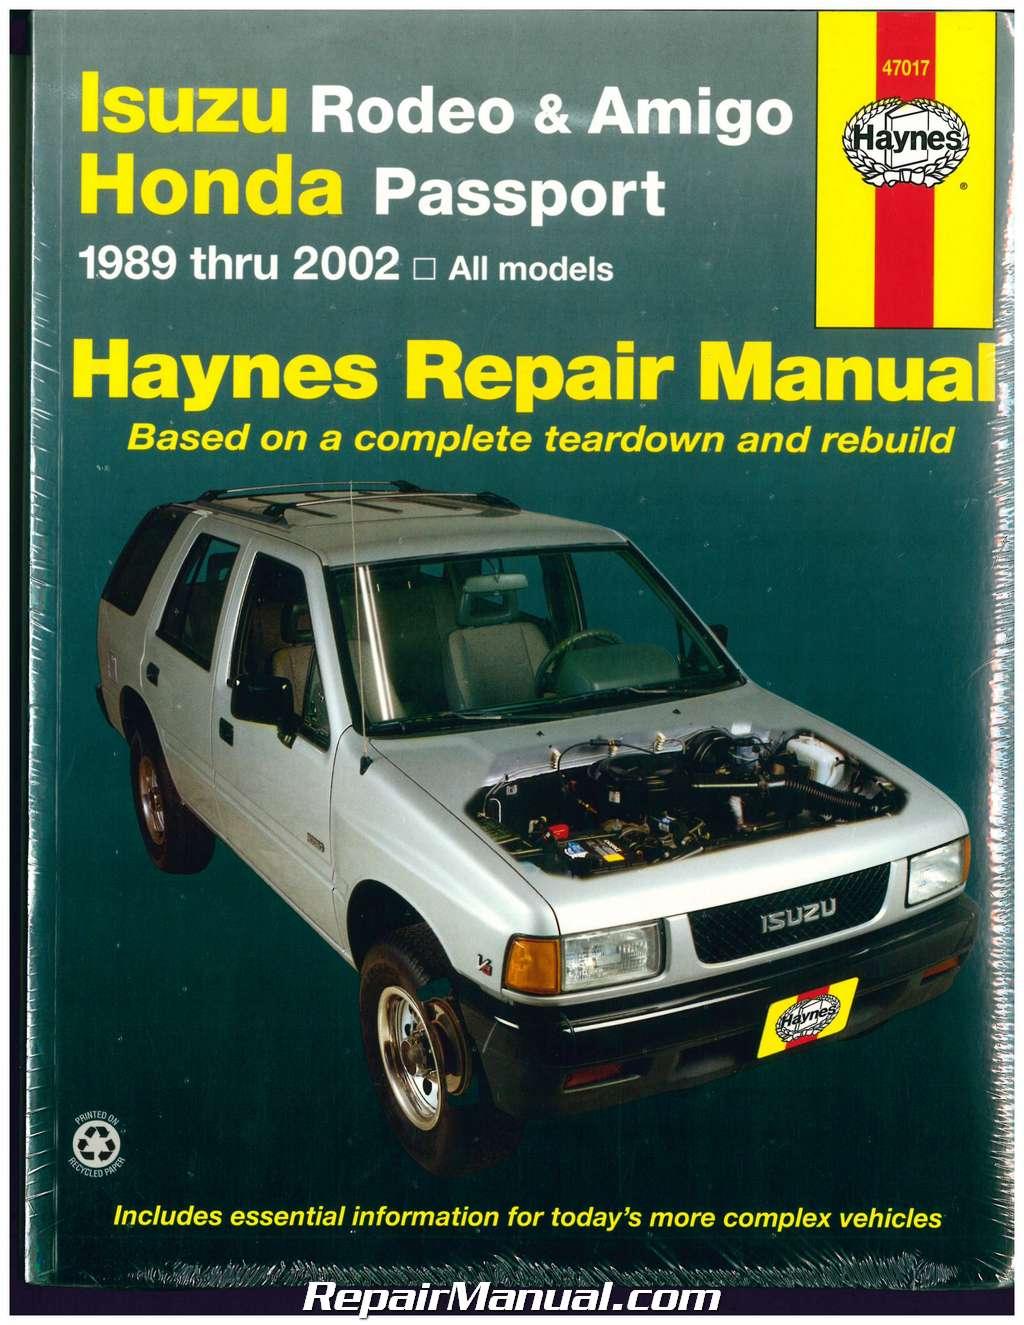 hight resolution of details about isuzu rodeo amigo honda passport 1989 2002 haynes automotive repair manual